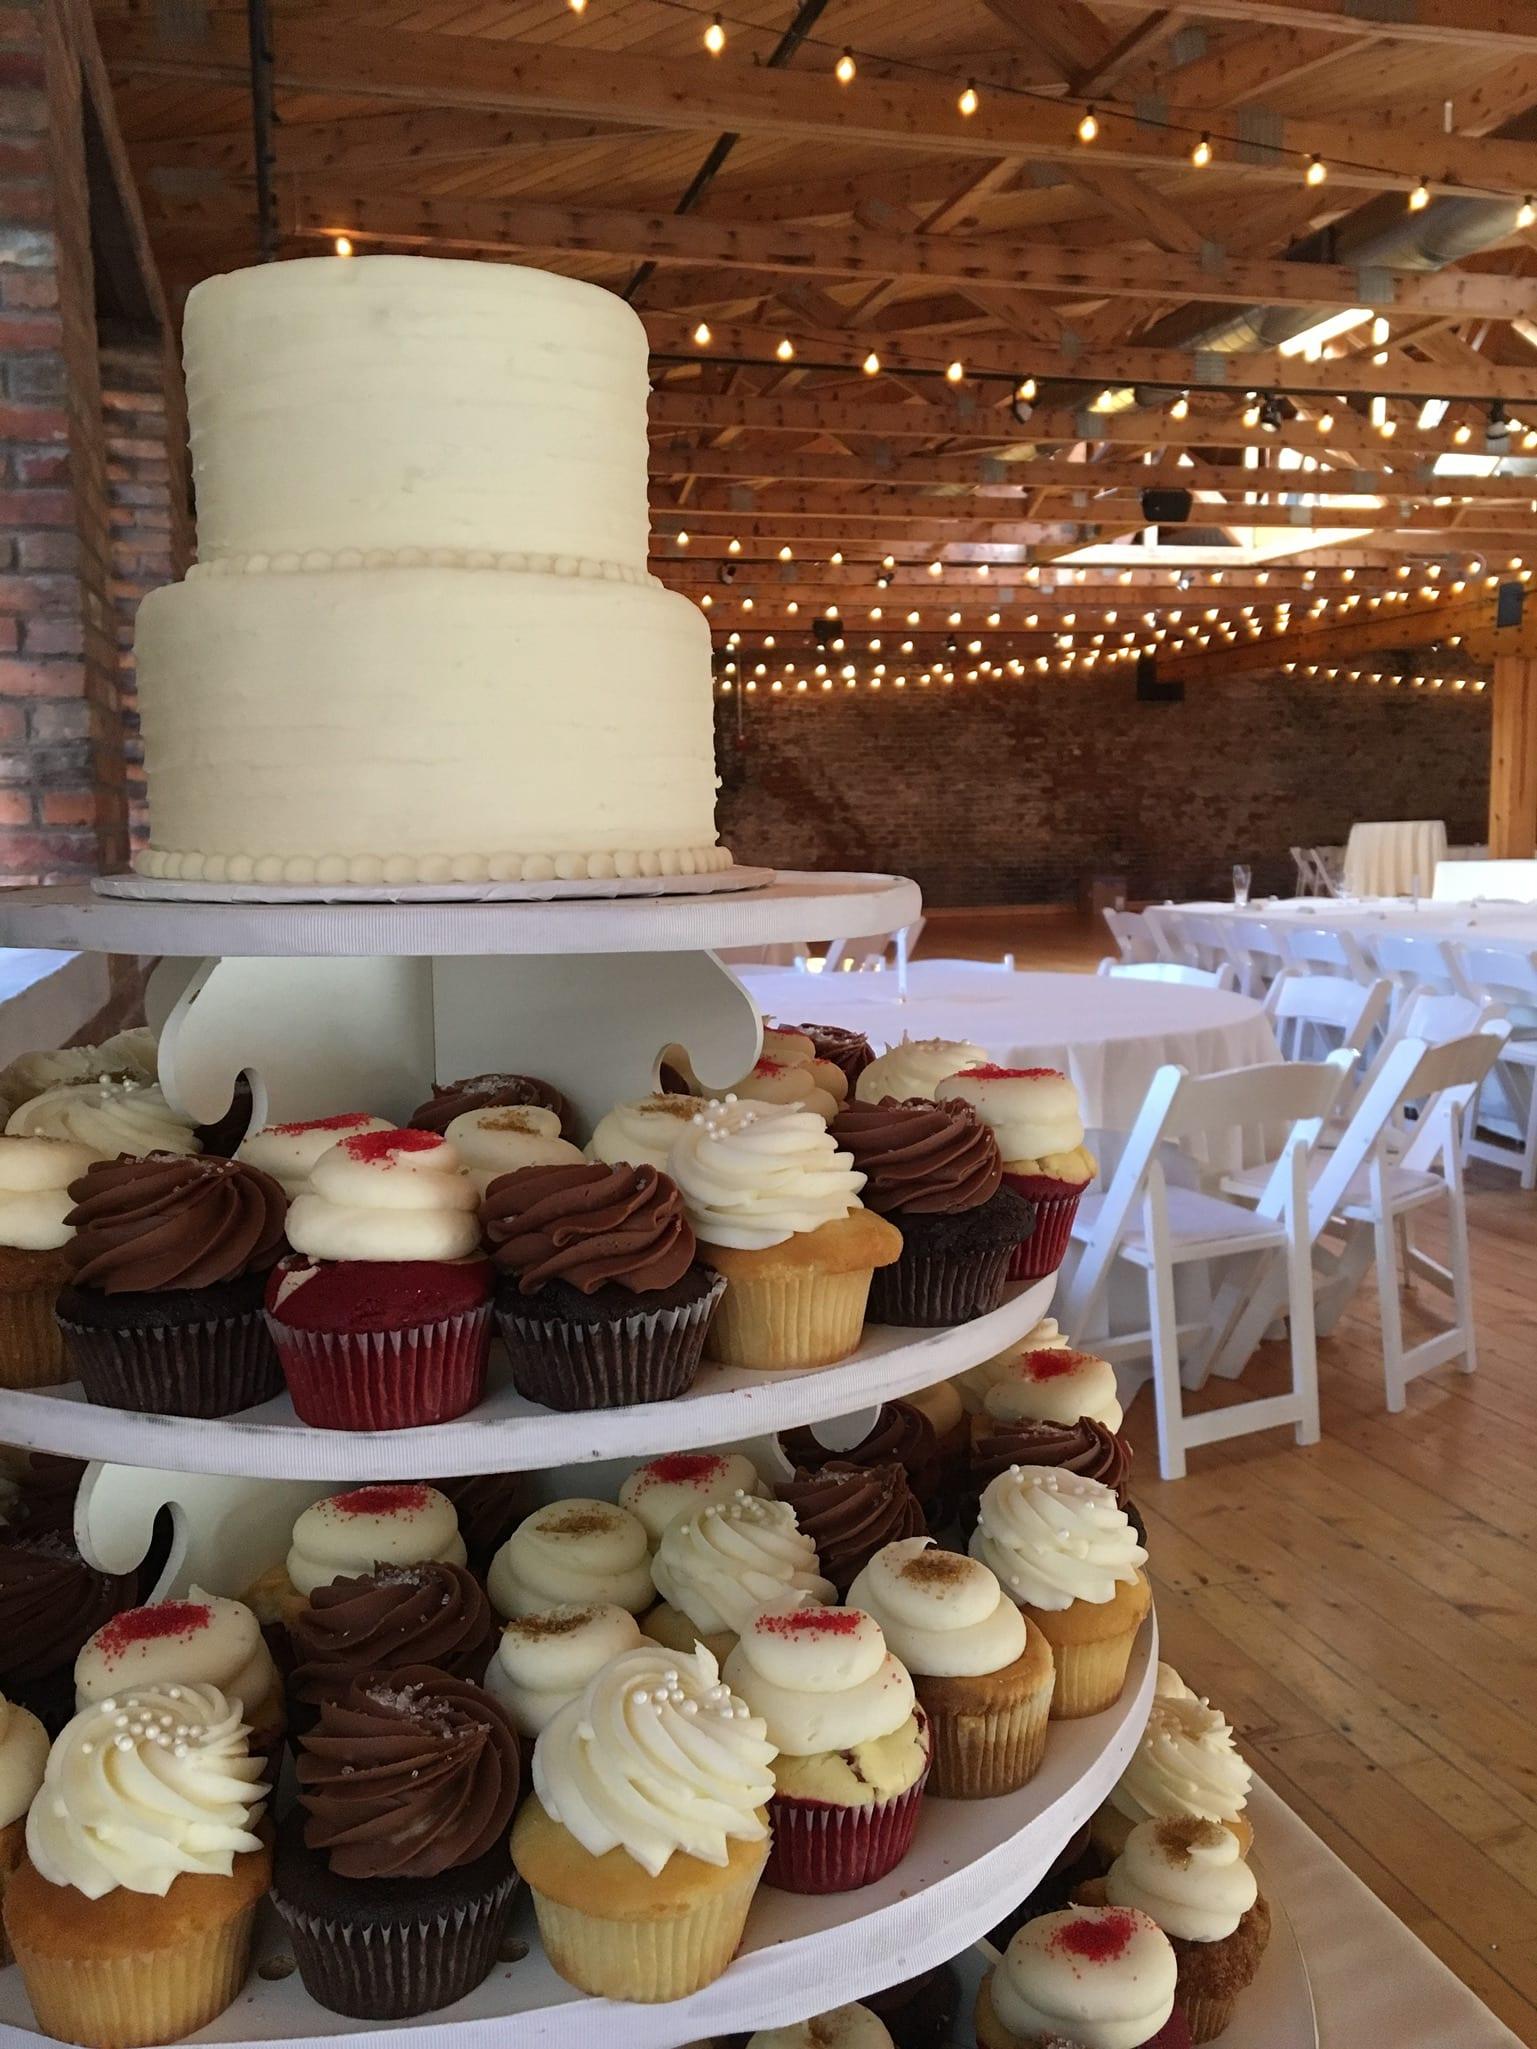 Wedding Cupcake Display at Rhinegeist Brewery | 3 Sweet Girls Cakery